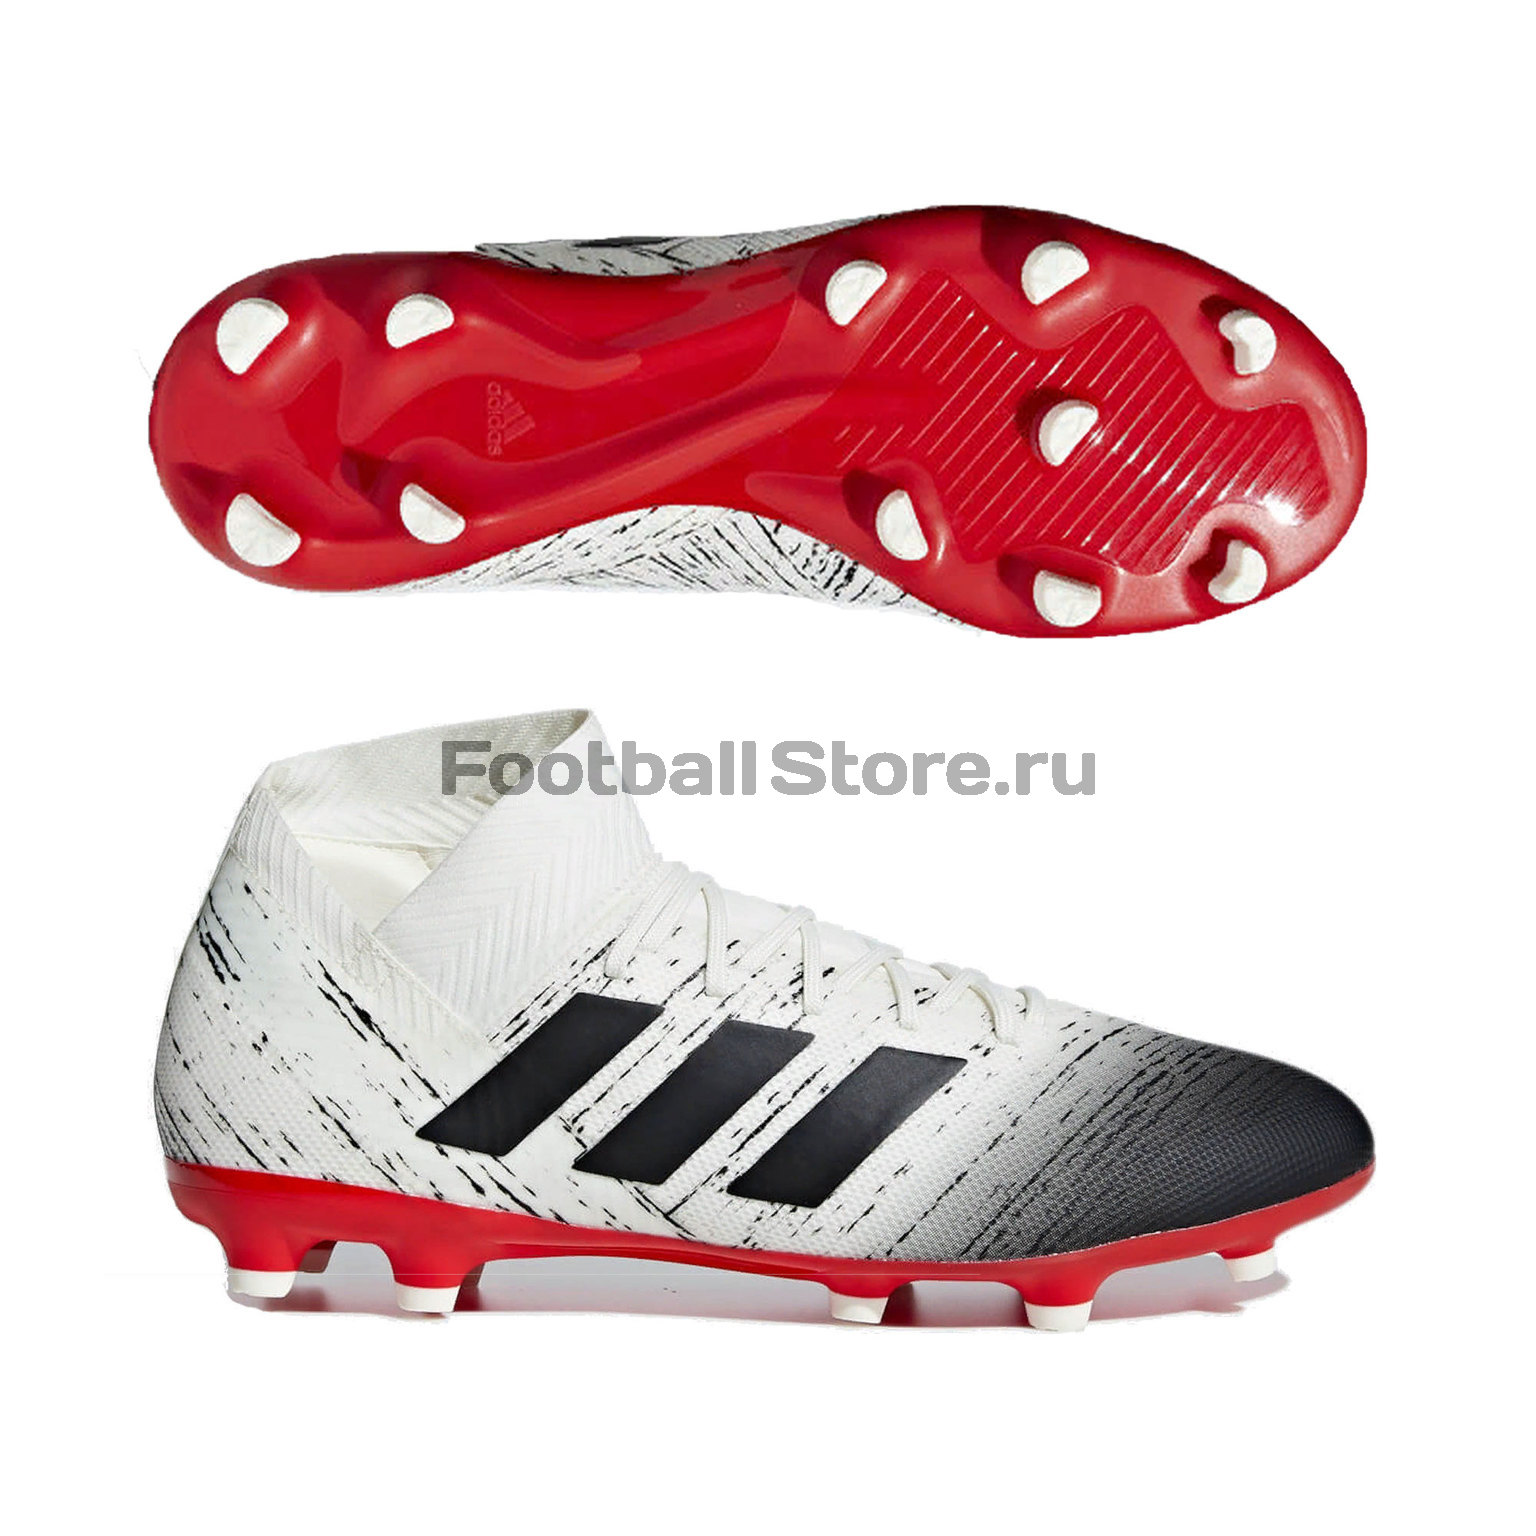 Бутсы Adidas Nemeziz 18.3 FG BB9437 бутсы adidas nemeziz messi 17 1 fg cp9028